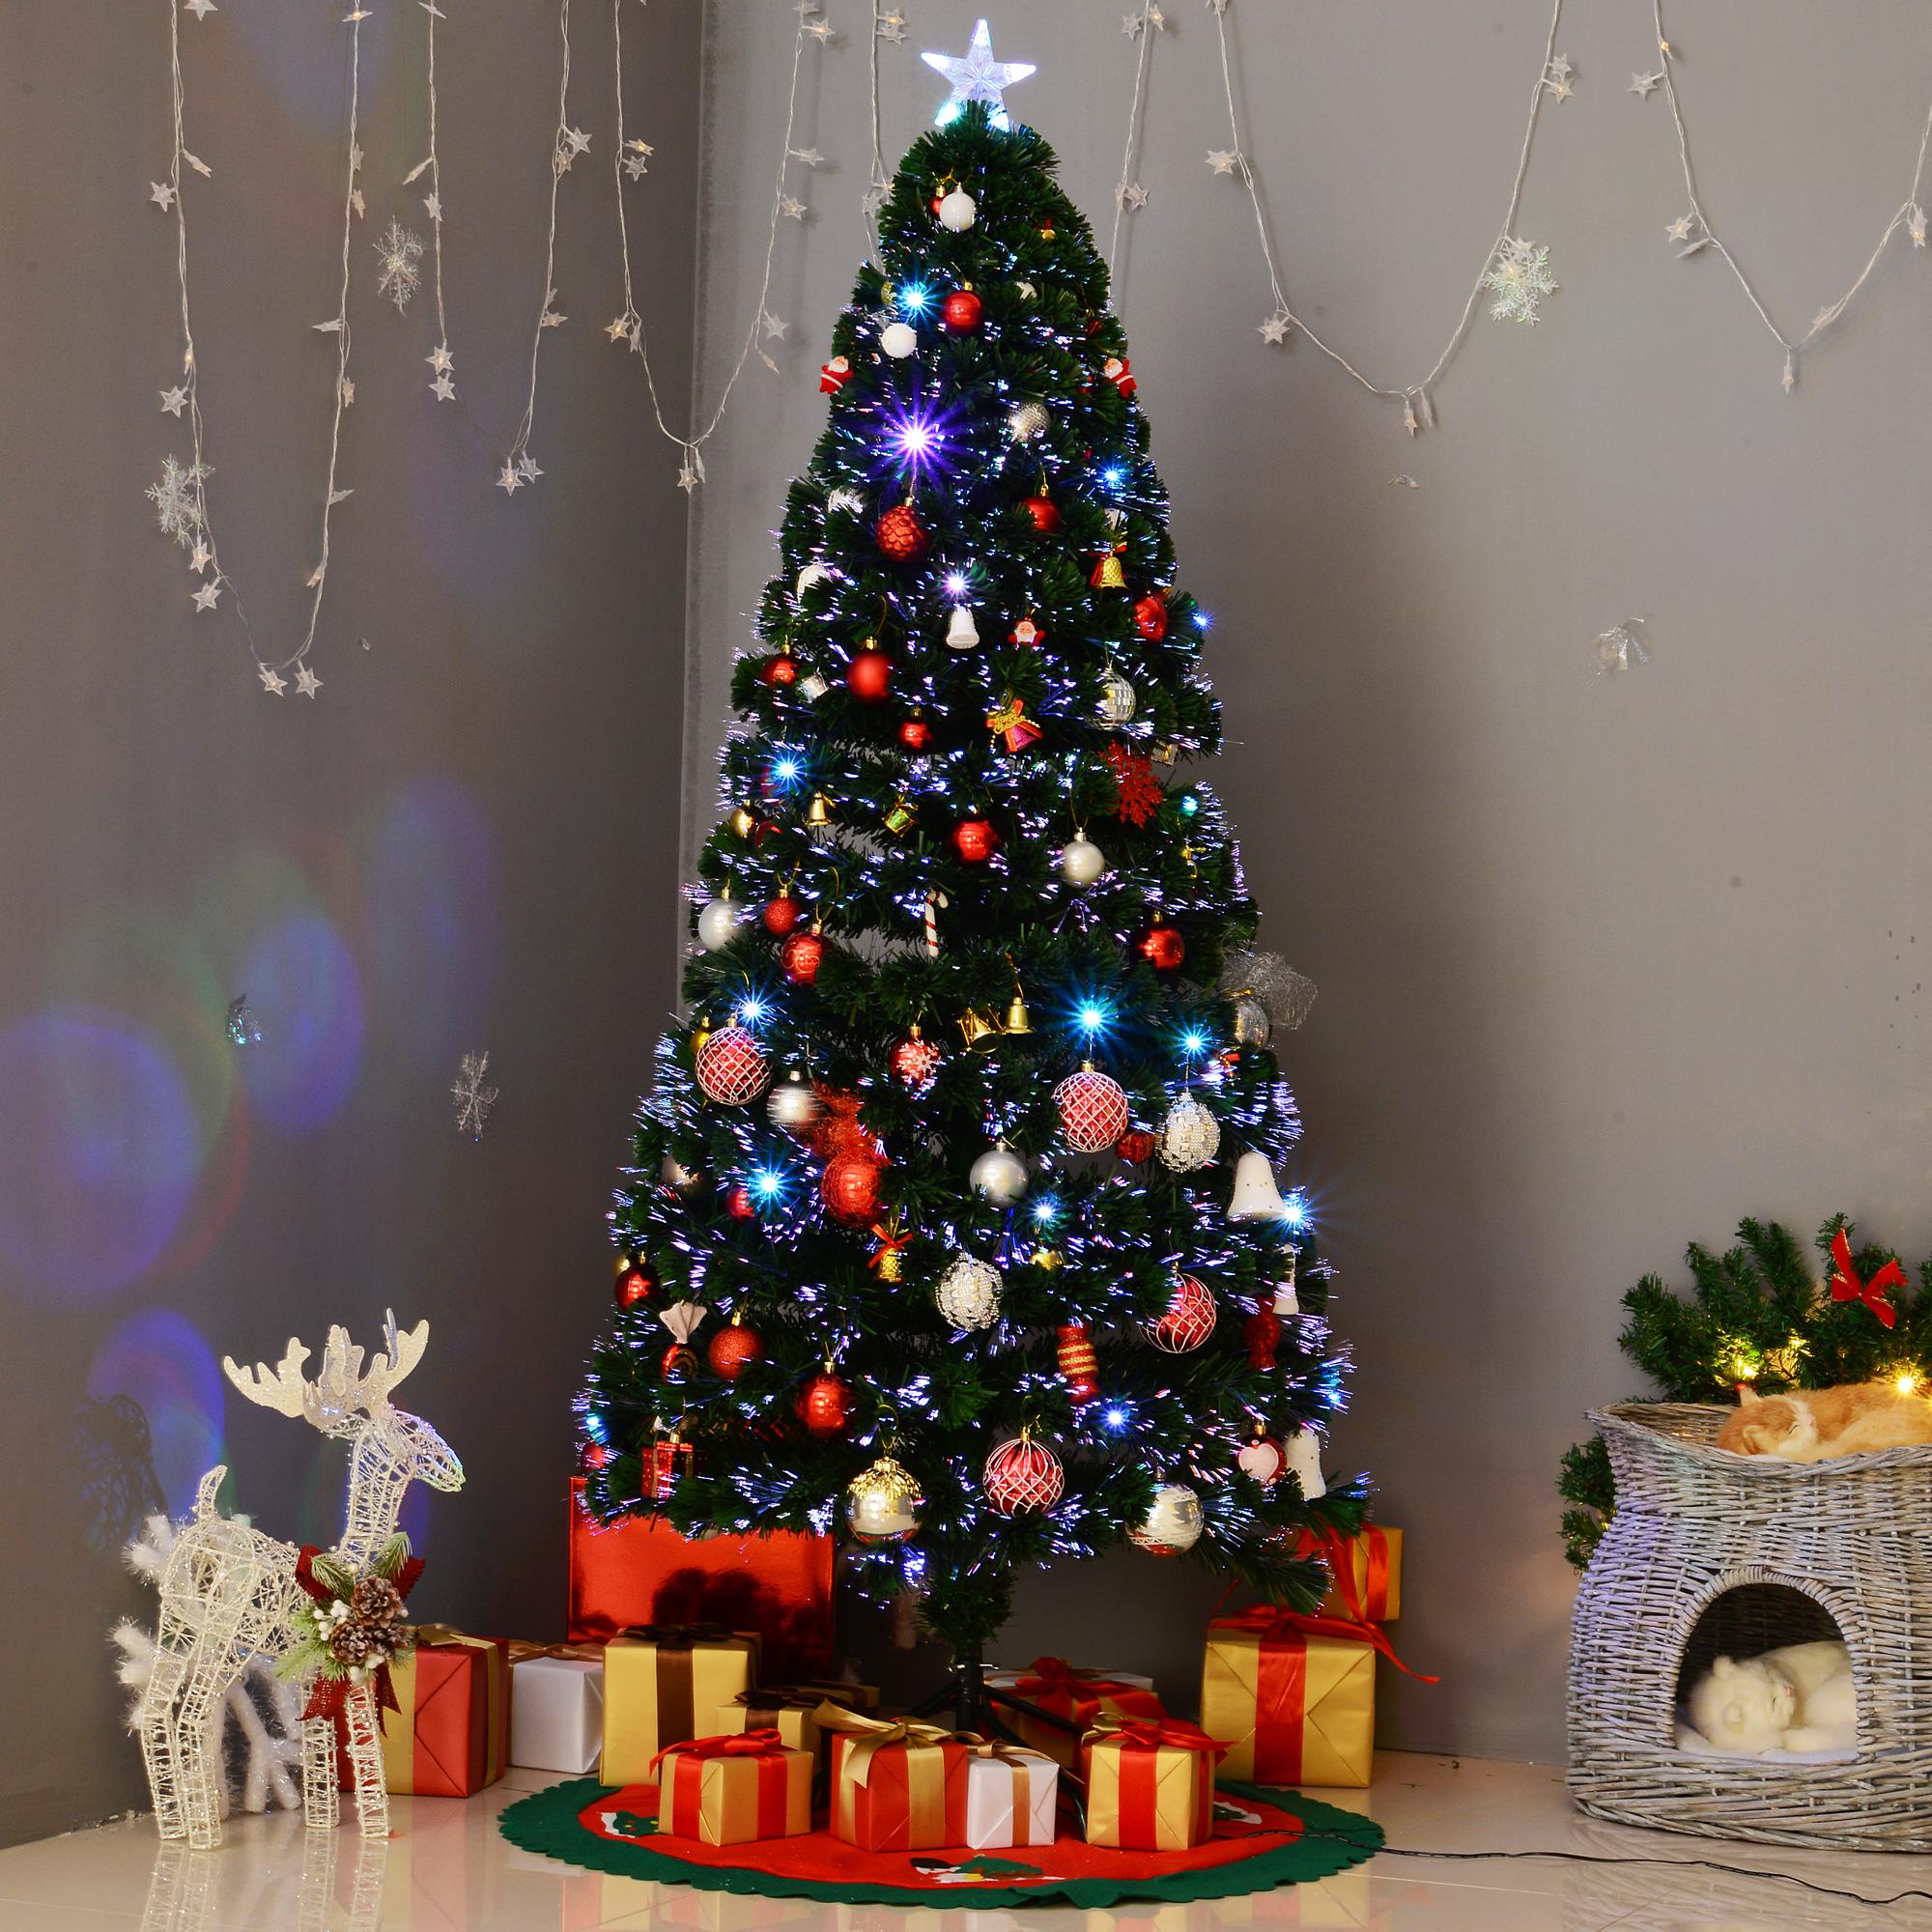 6 Pre Lit Fiber Optic Artificial Christmas Tree Colorful Led Lights Decorations 603161408236 Ebay